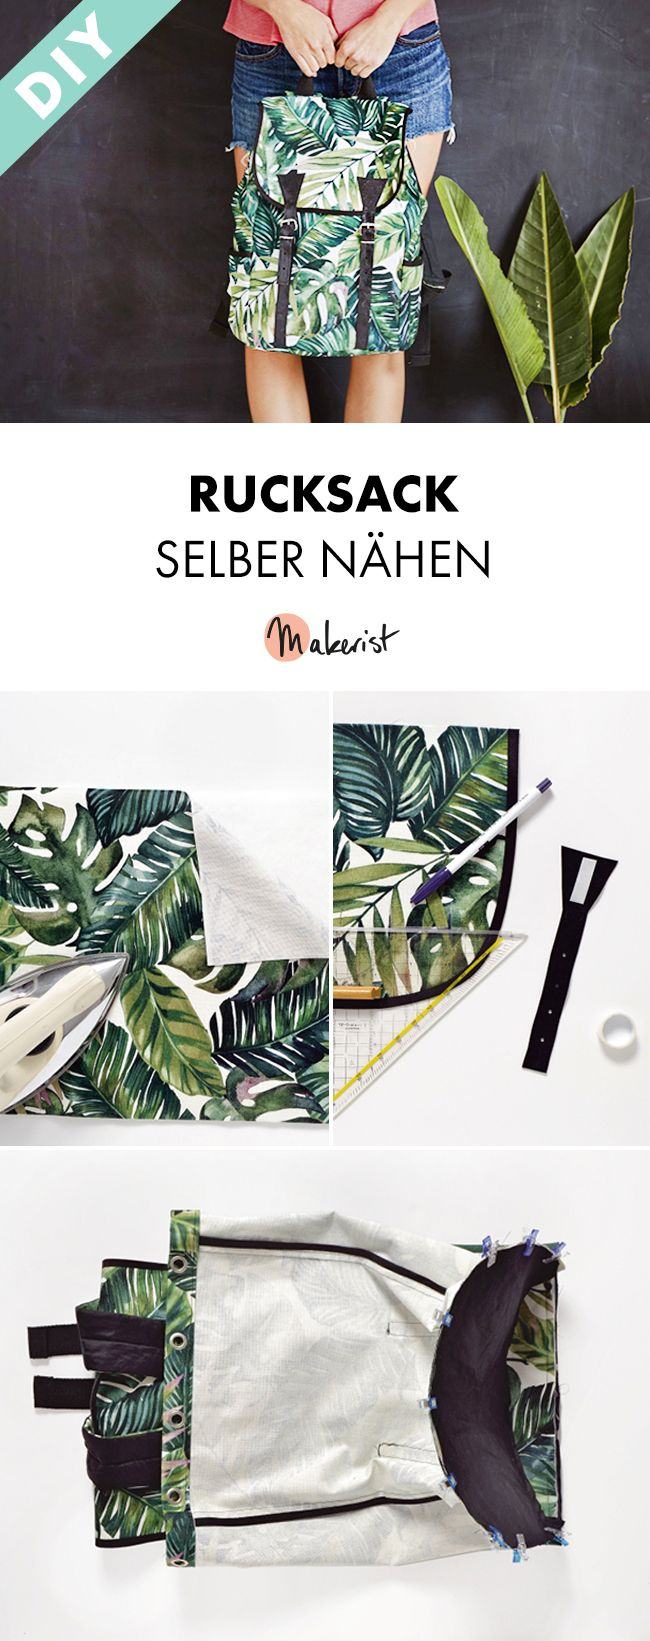 Rucksack selber nähen - Gratis-Nähanleitung und Schnittmuster via Makerist.de